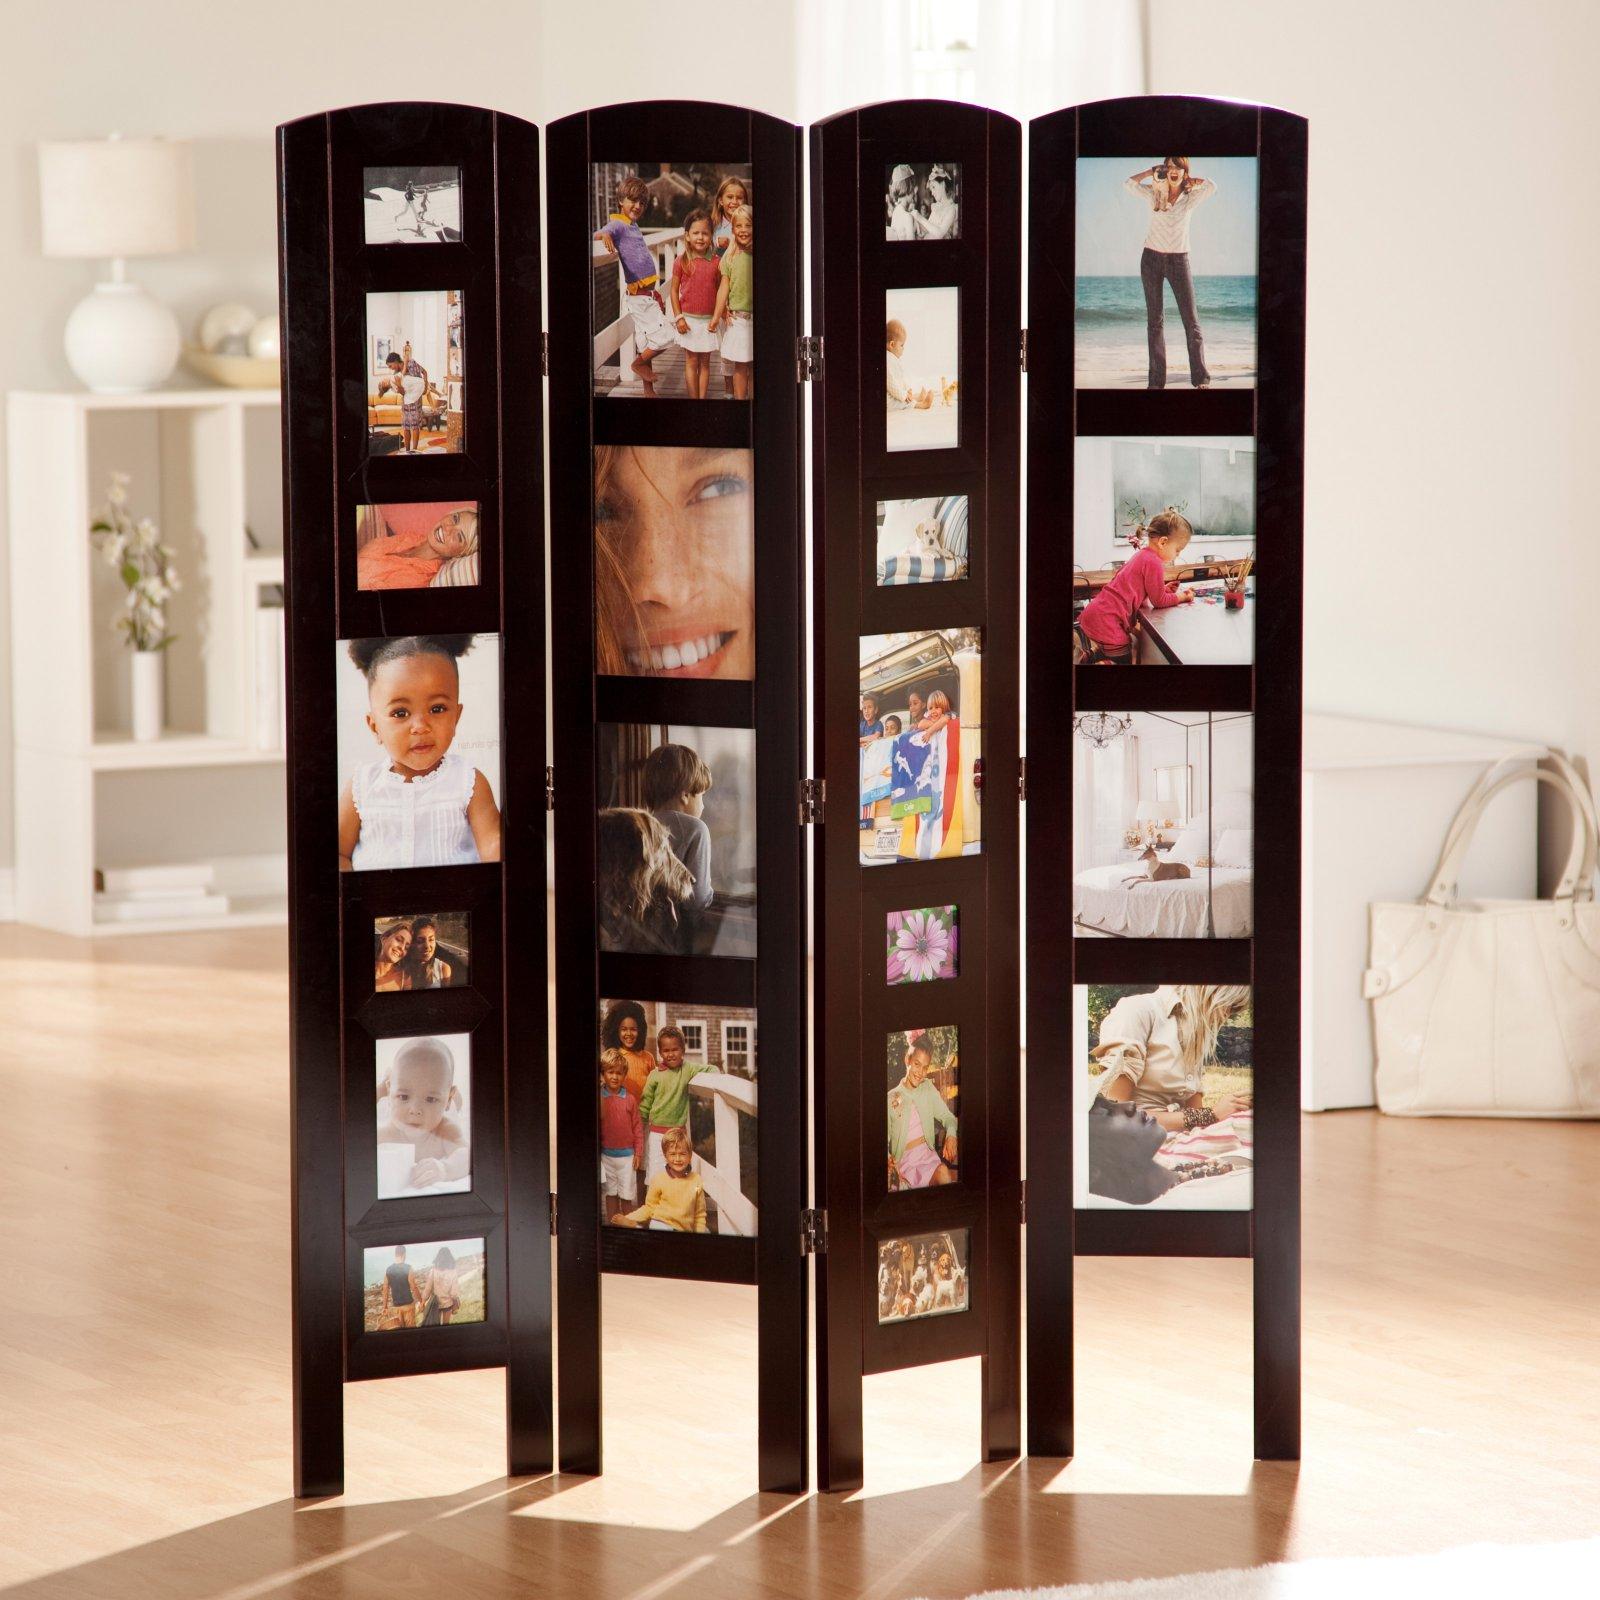 Memories Photo Frame Room Divider - Rosewood 4 Panel